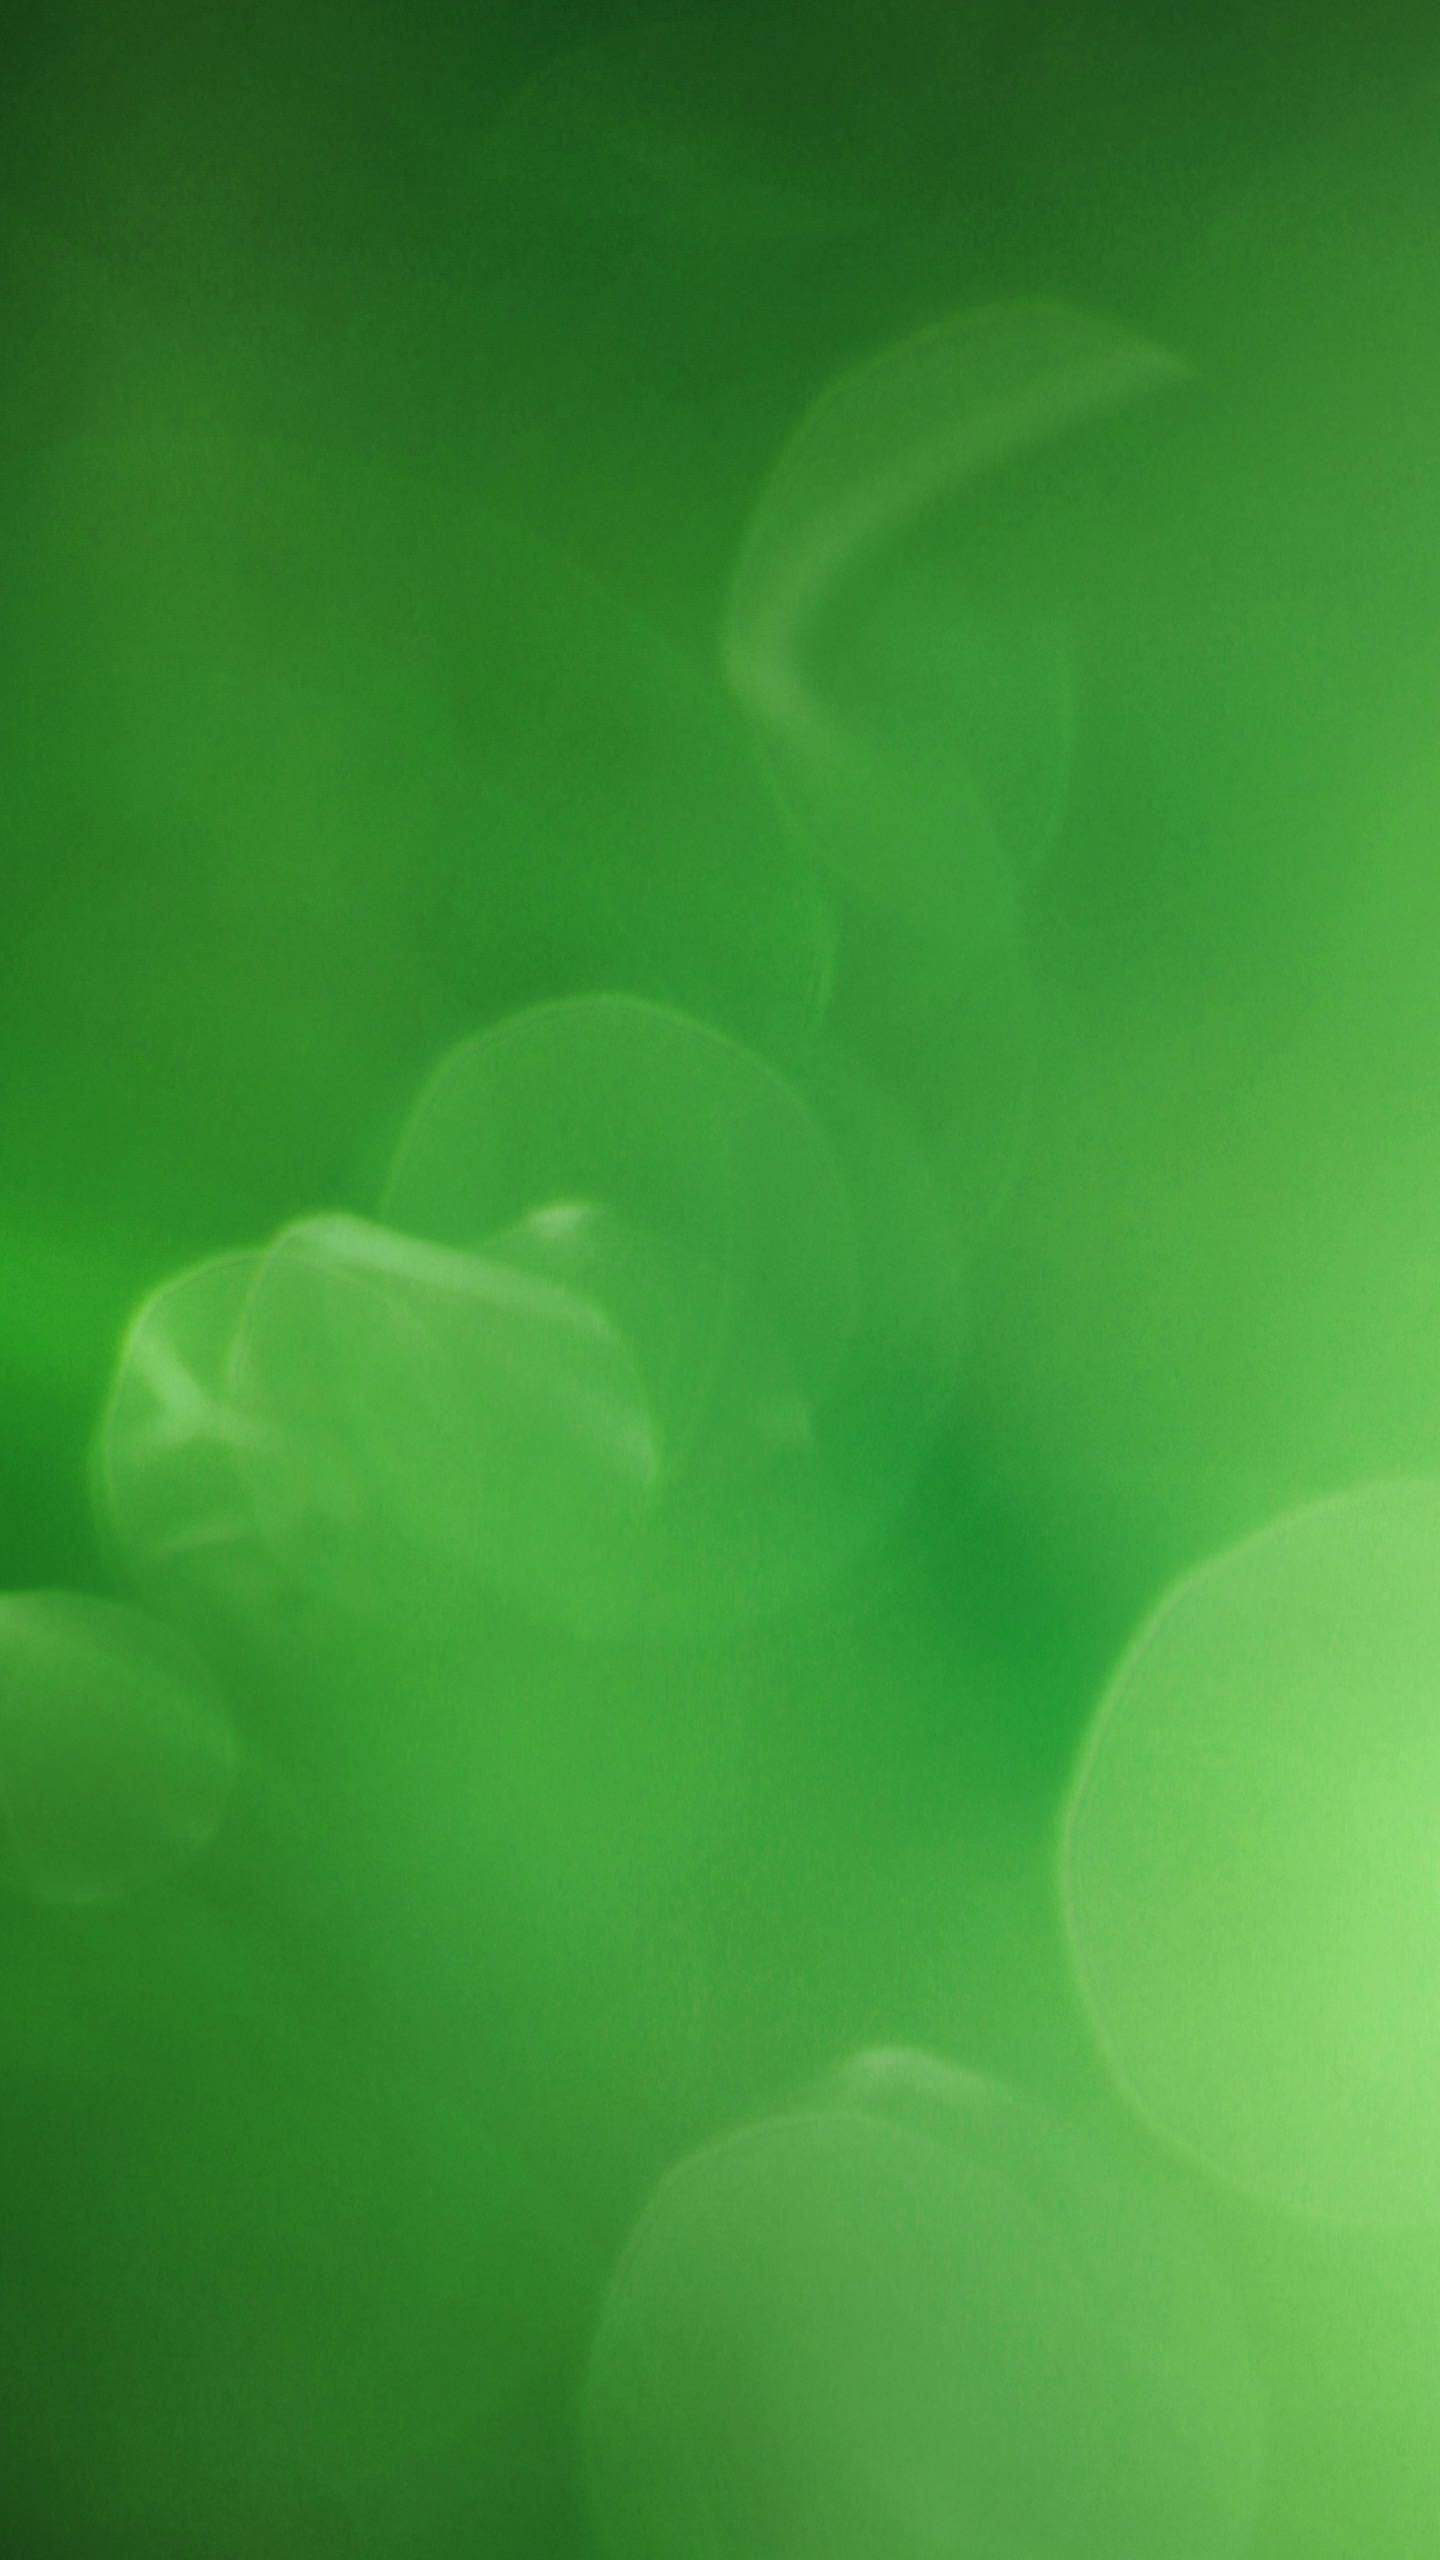 Cool green circle wallpaper smartphone smartphone quadhd wallpaper voltagebd Image collections